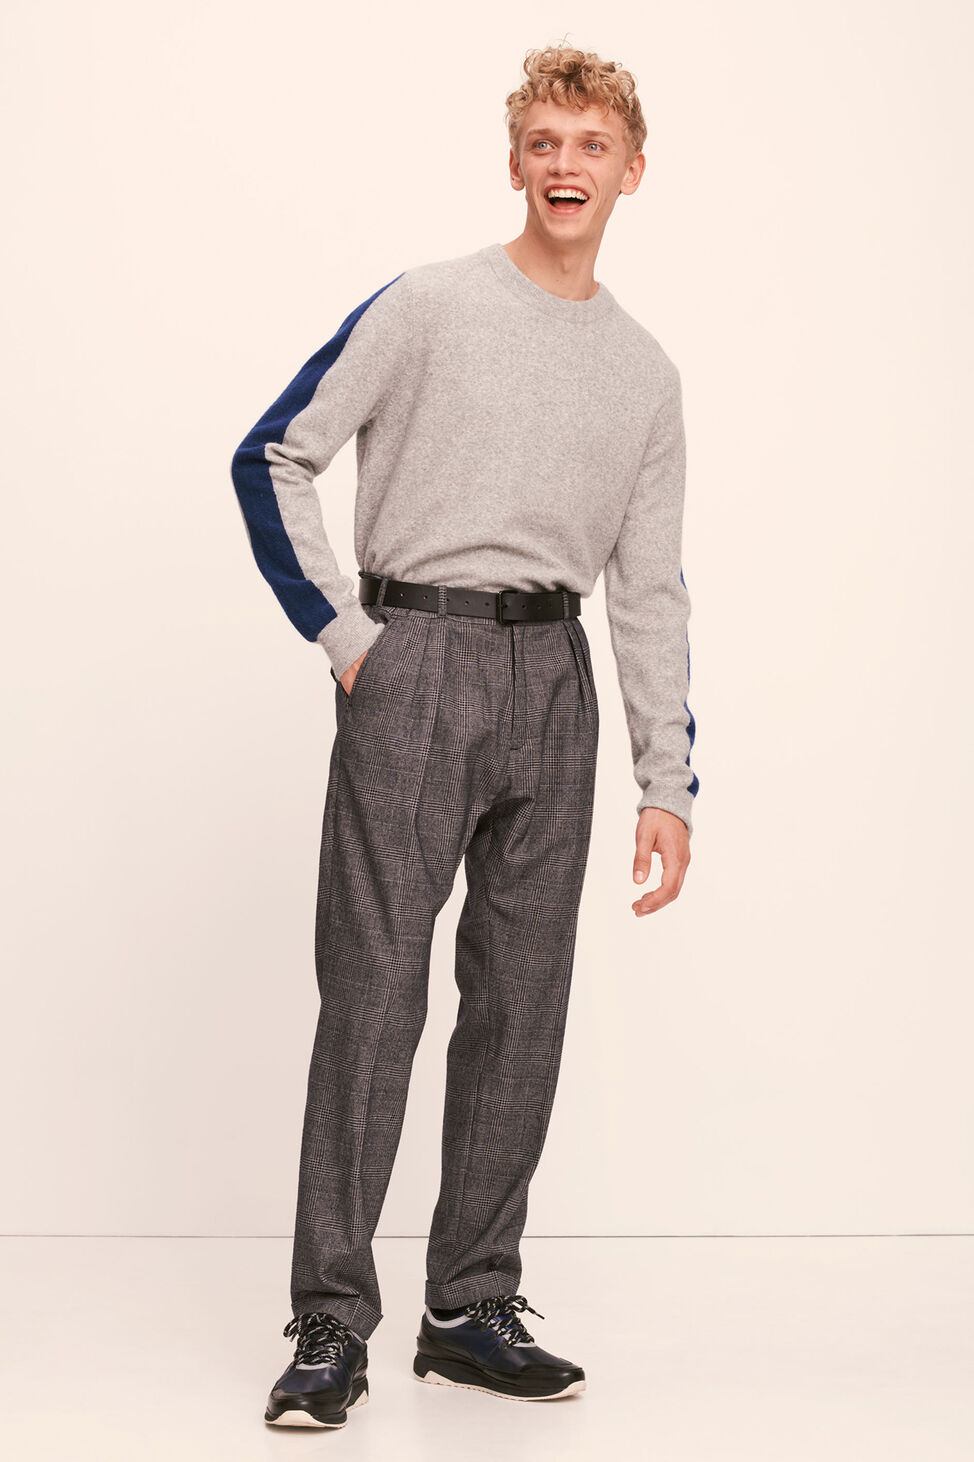 Athi adjuster pants 10513